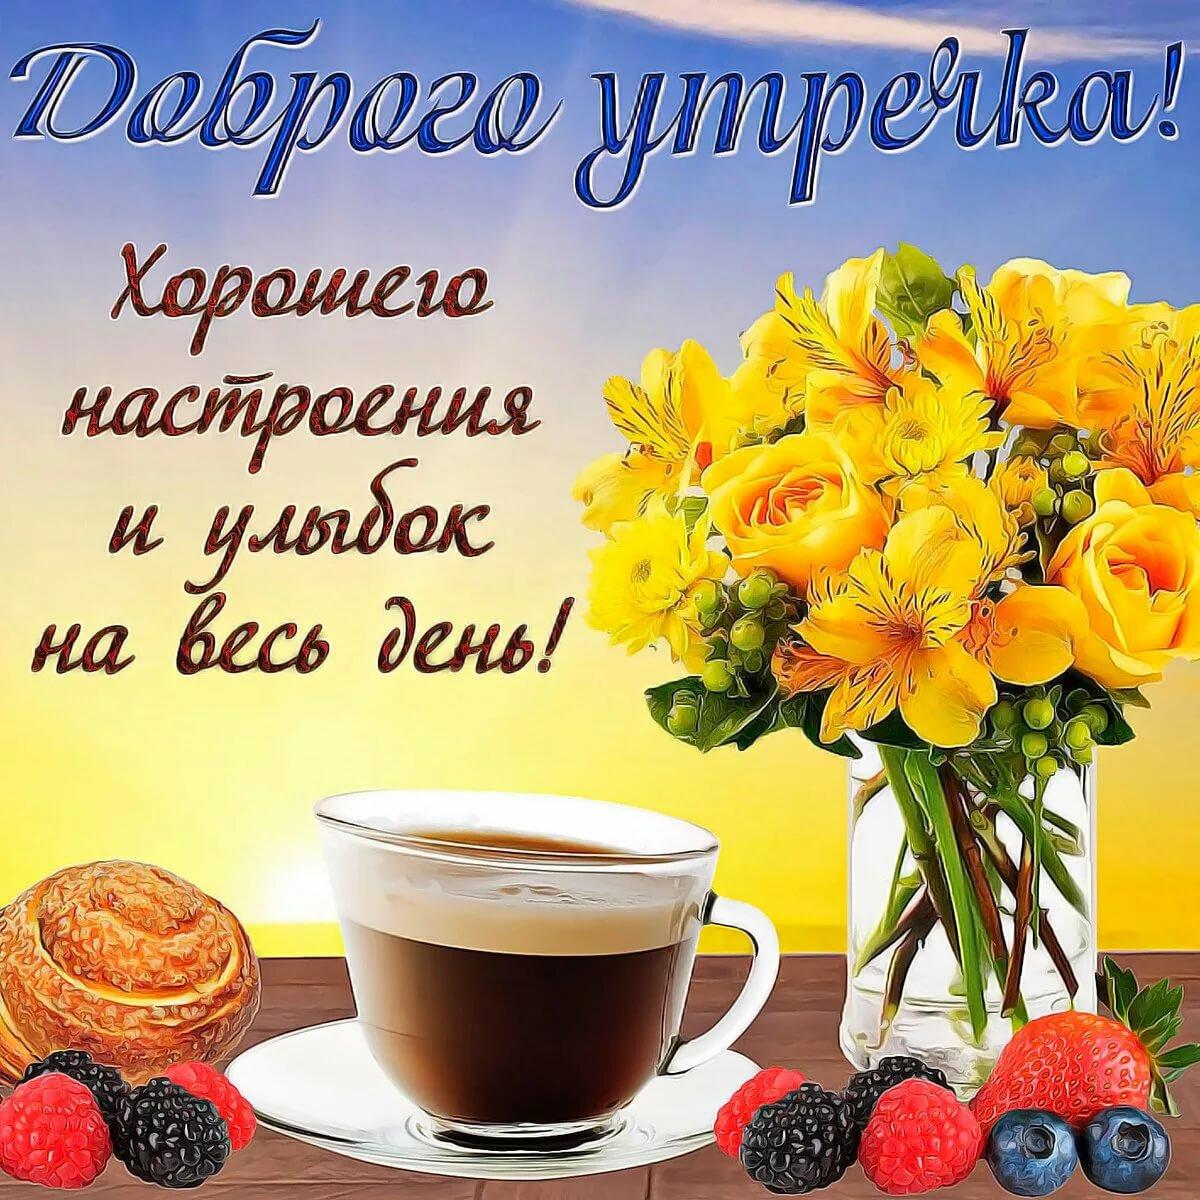 Картинки пожелать доброго утра друзьям